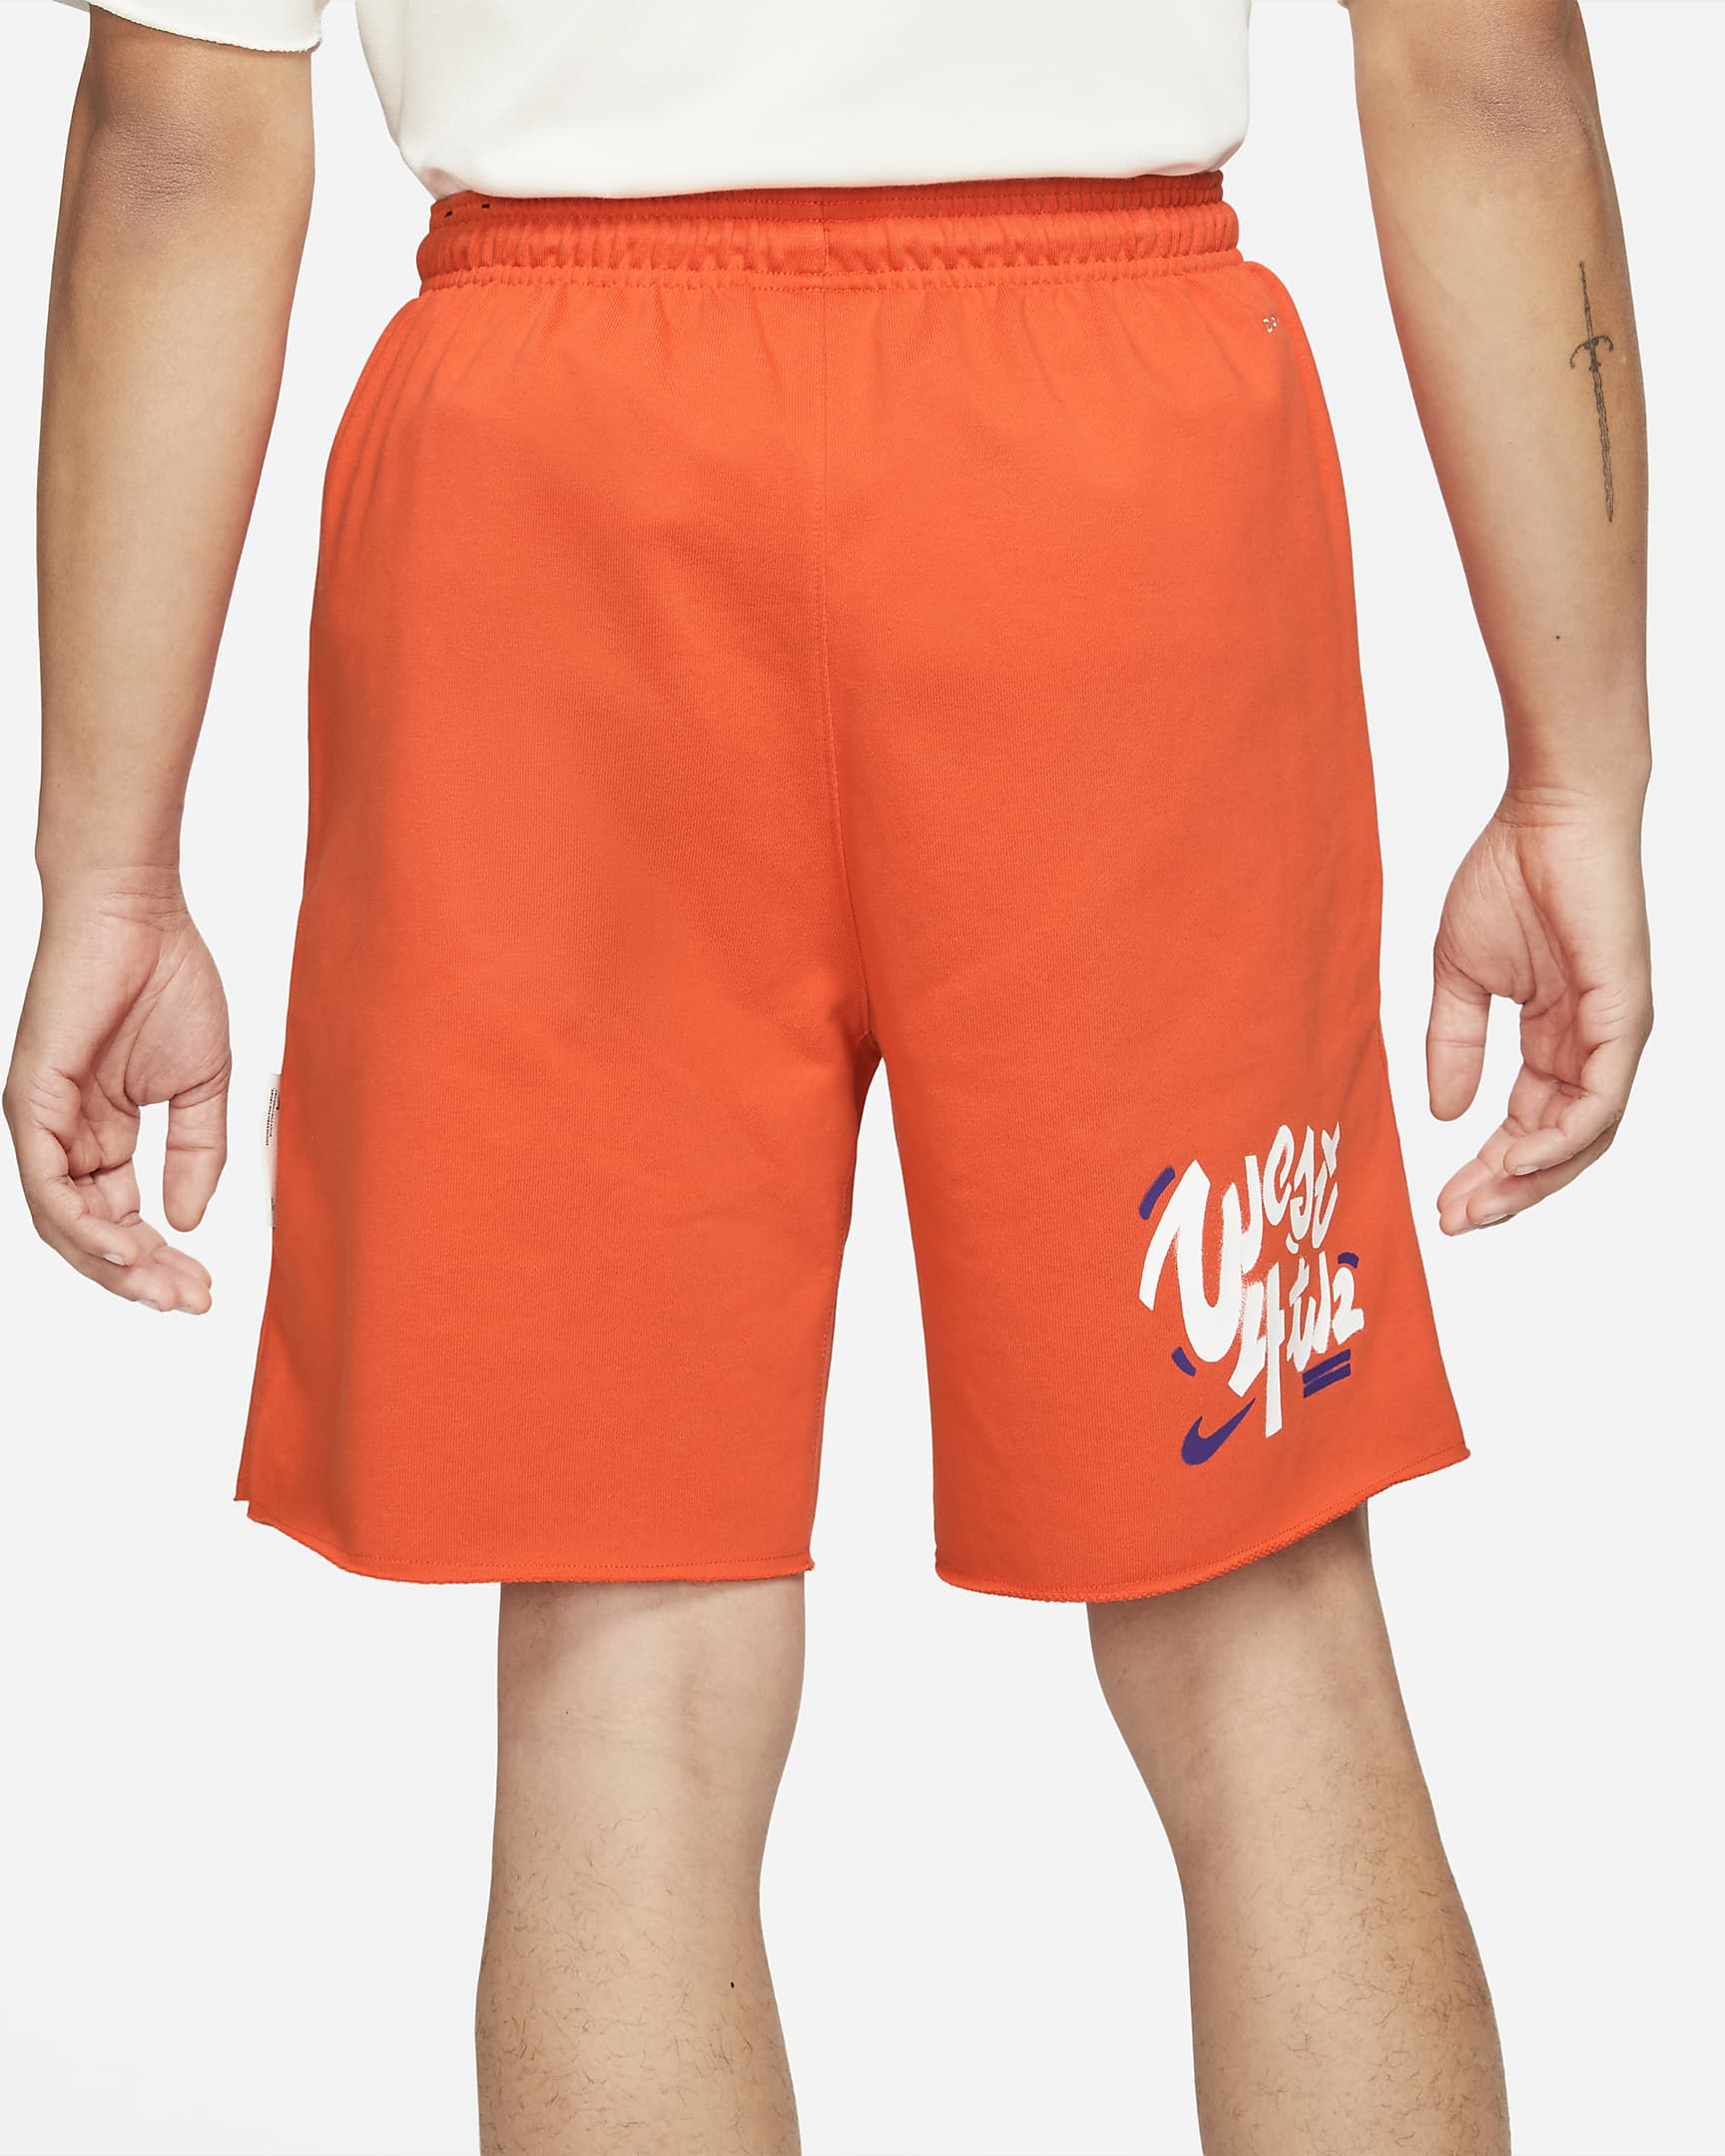 standard-issue-west-4th-mens-basketball-fleece-shorts-SClNHm-2.png